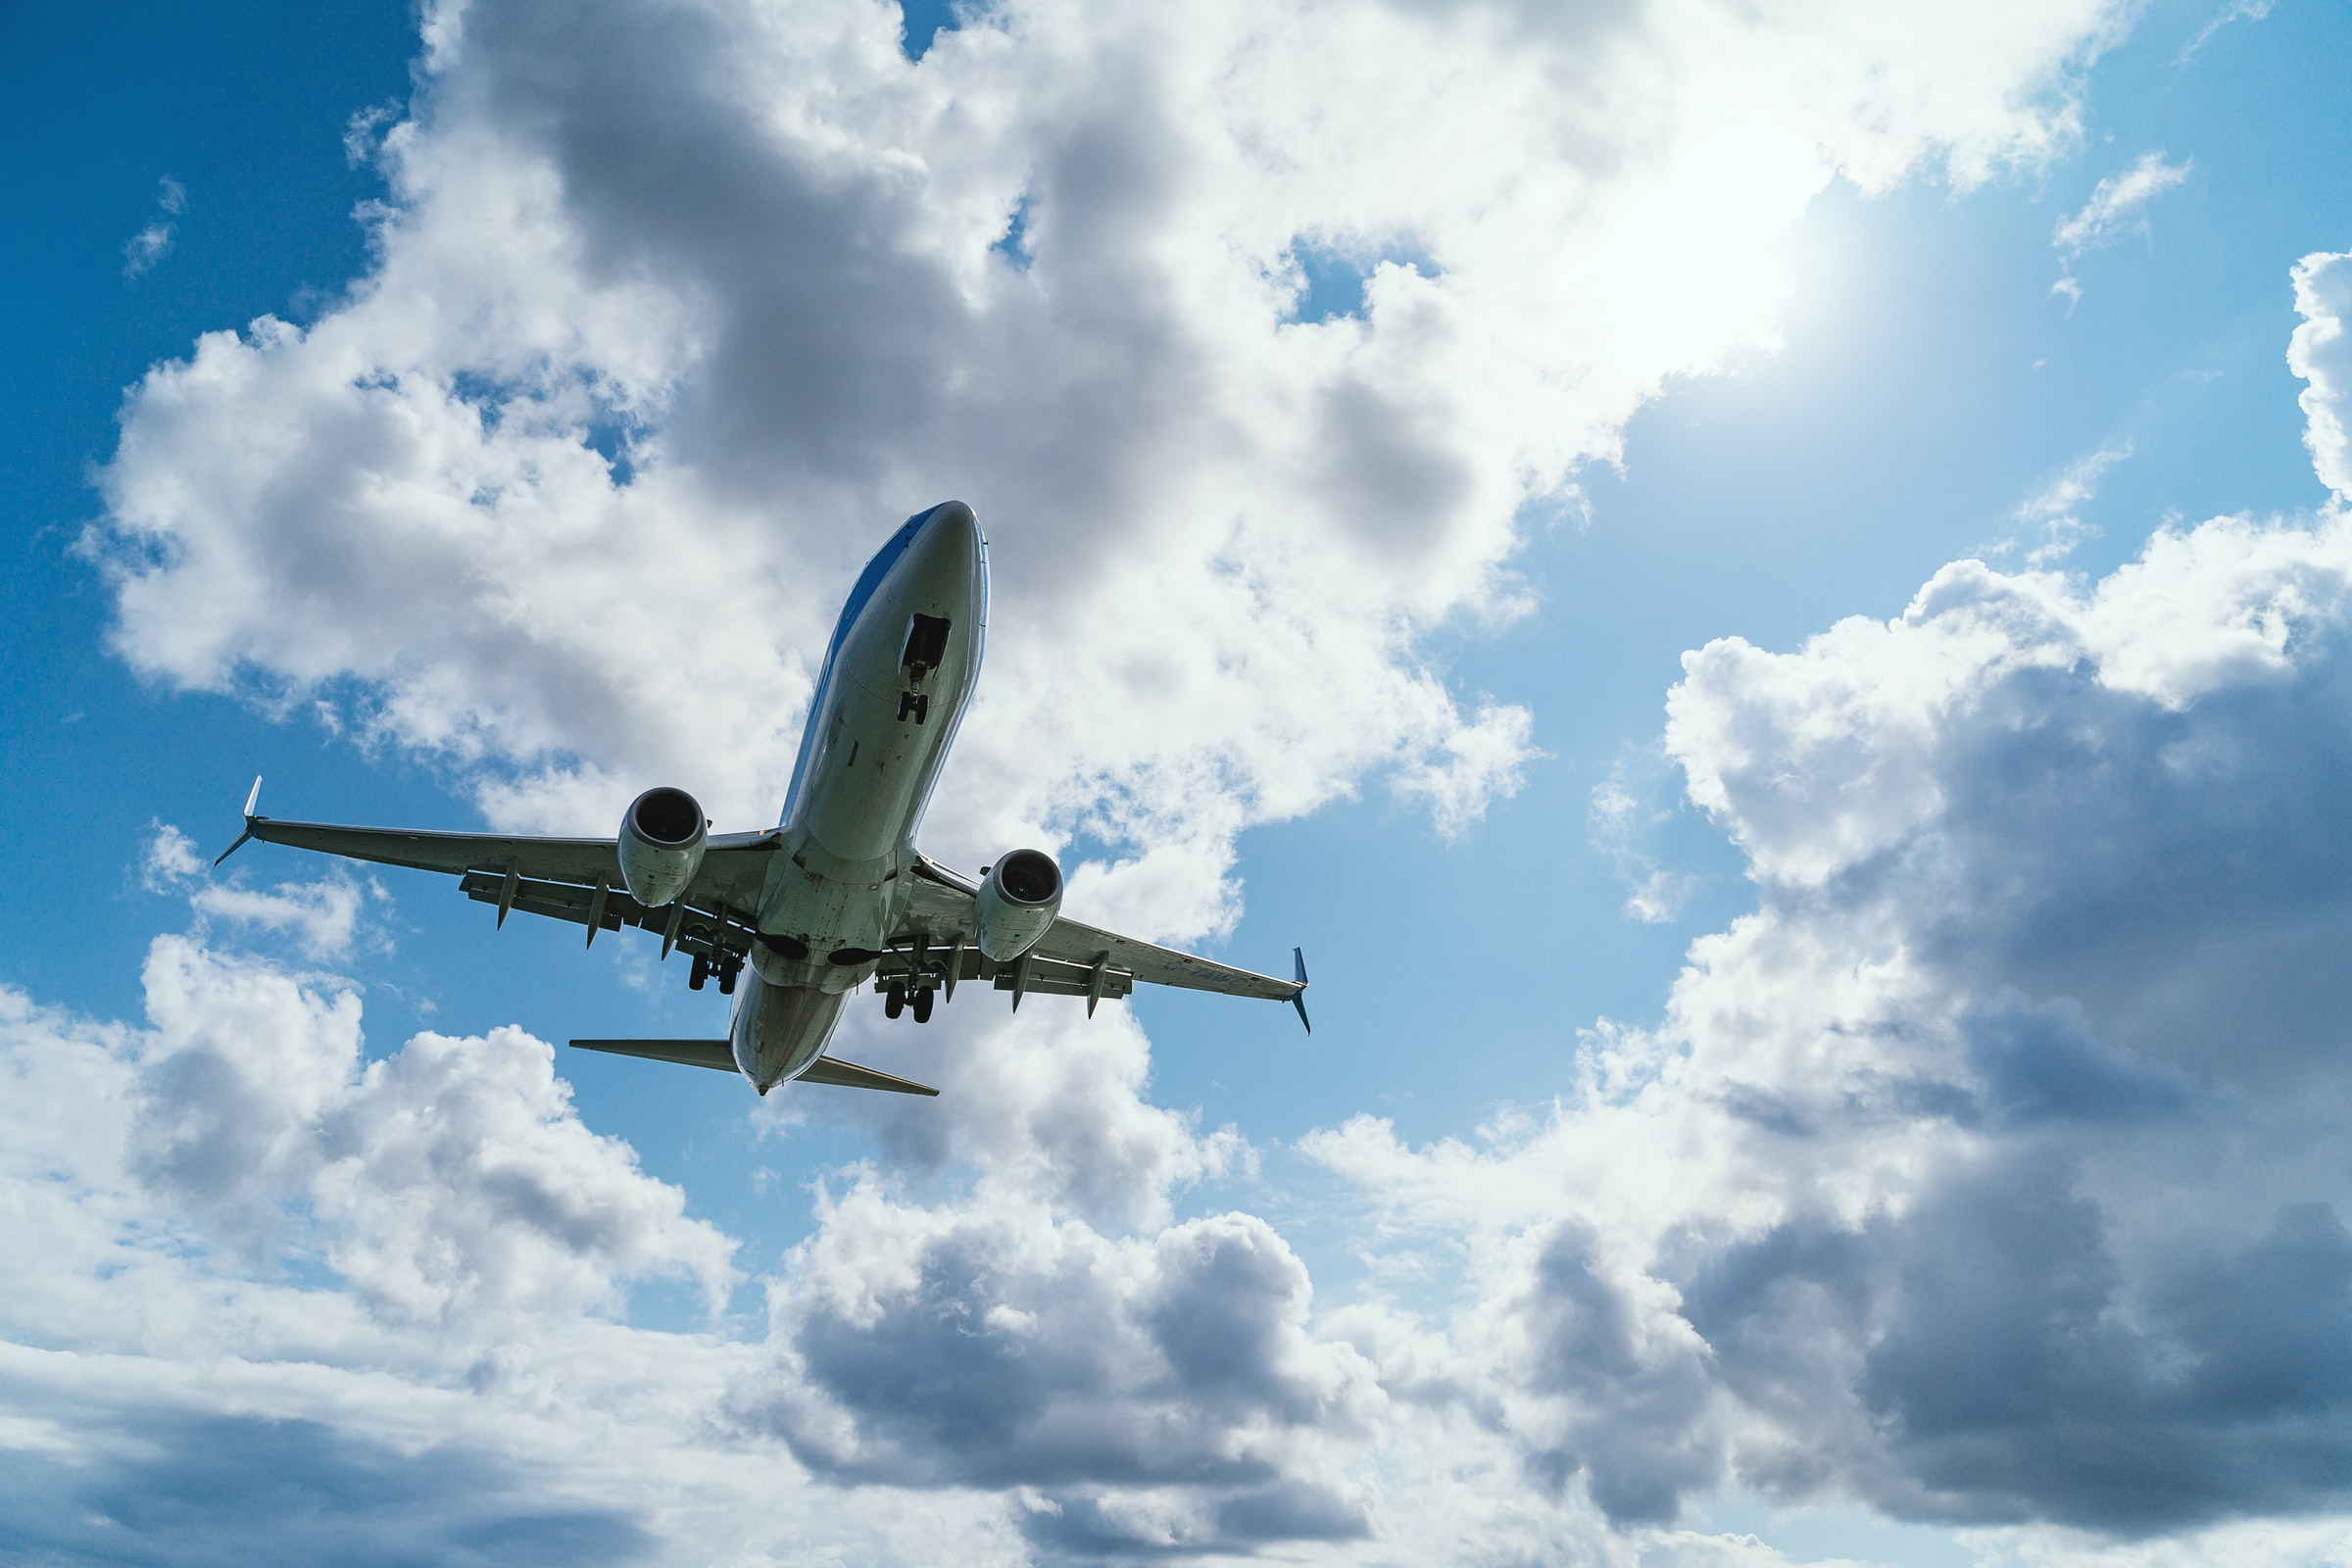 Voorzitter Commissie MER: Gevolgen luchtvaartplannen minister onvoldoende onderzocht